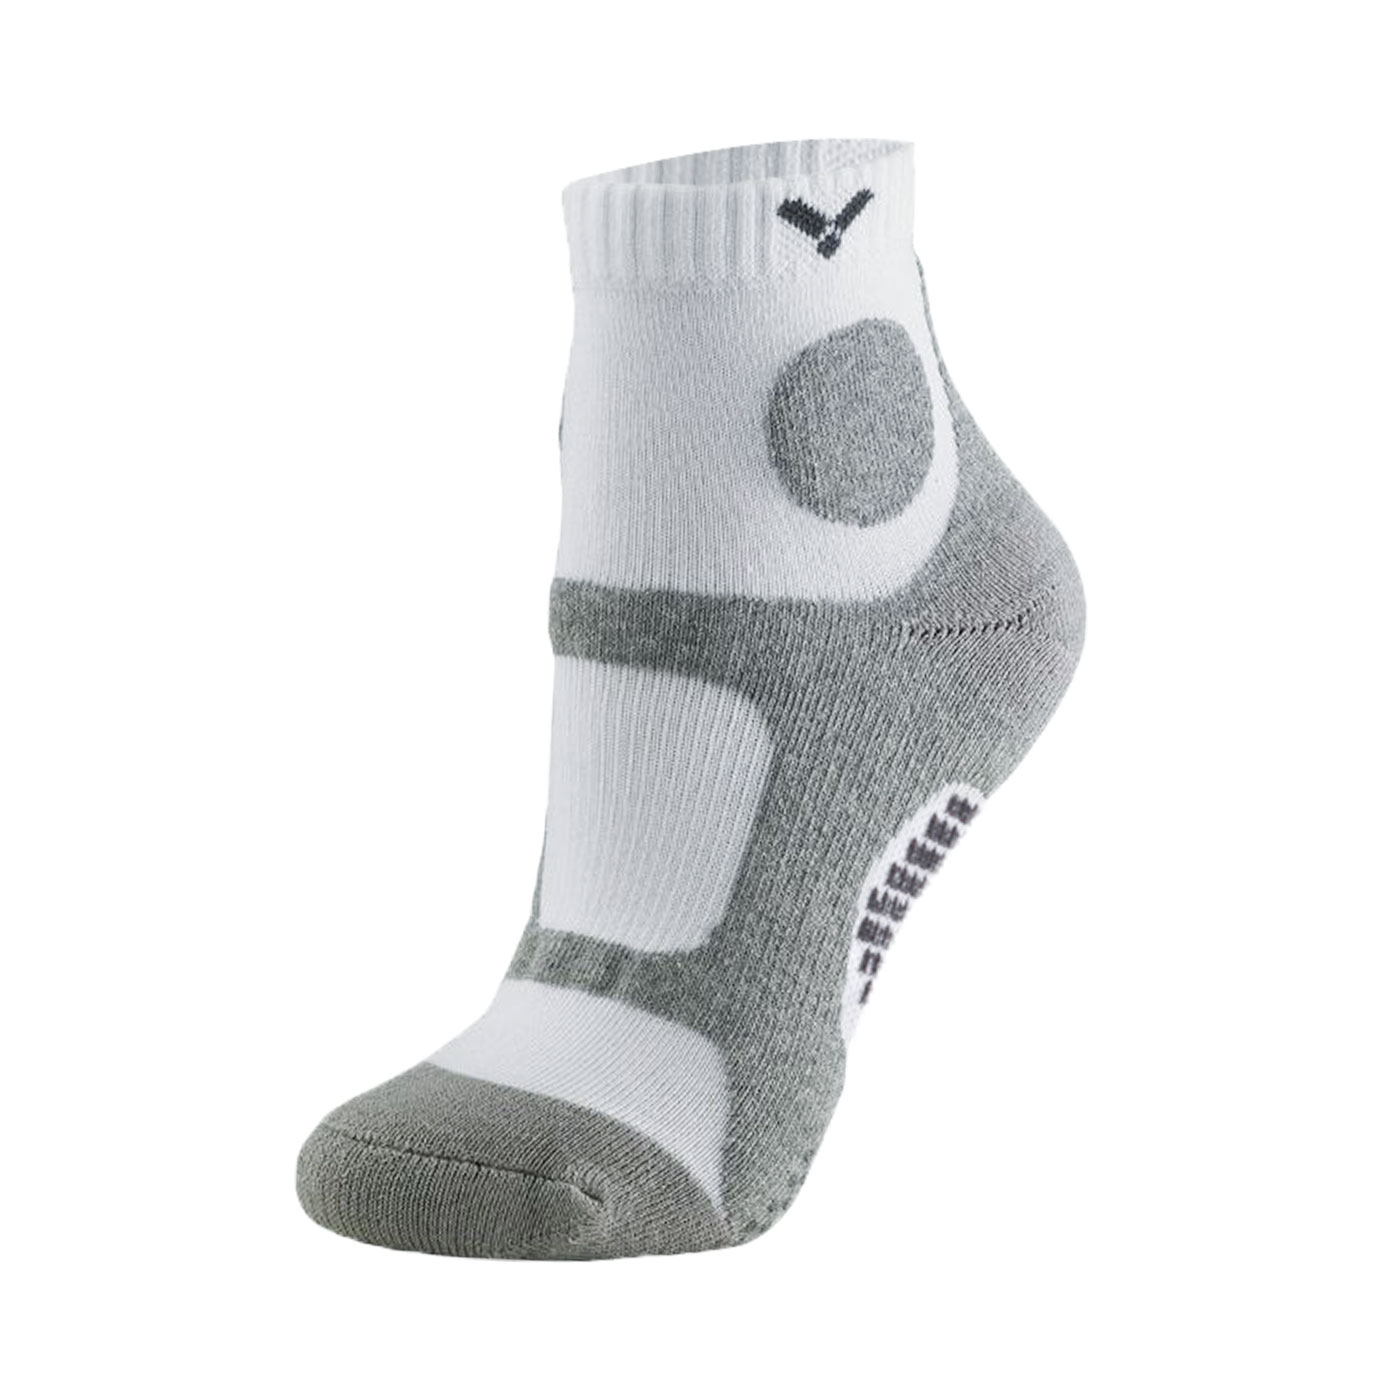 VICTOR 羽球機能襪 C-5048A - 灰白